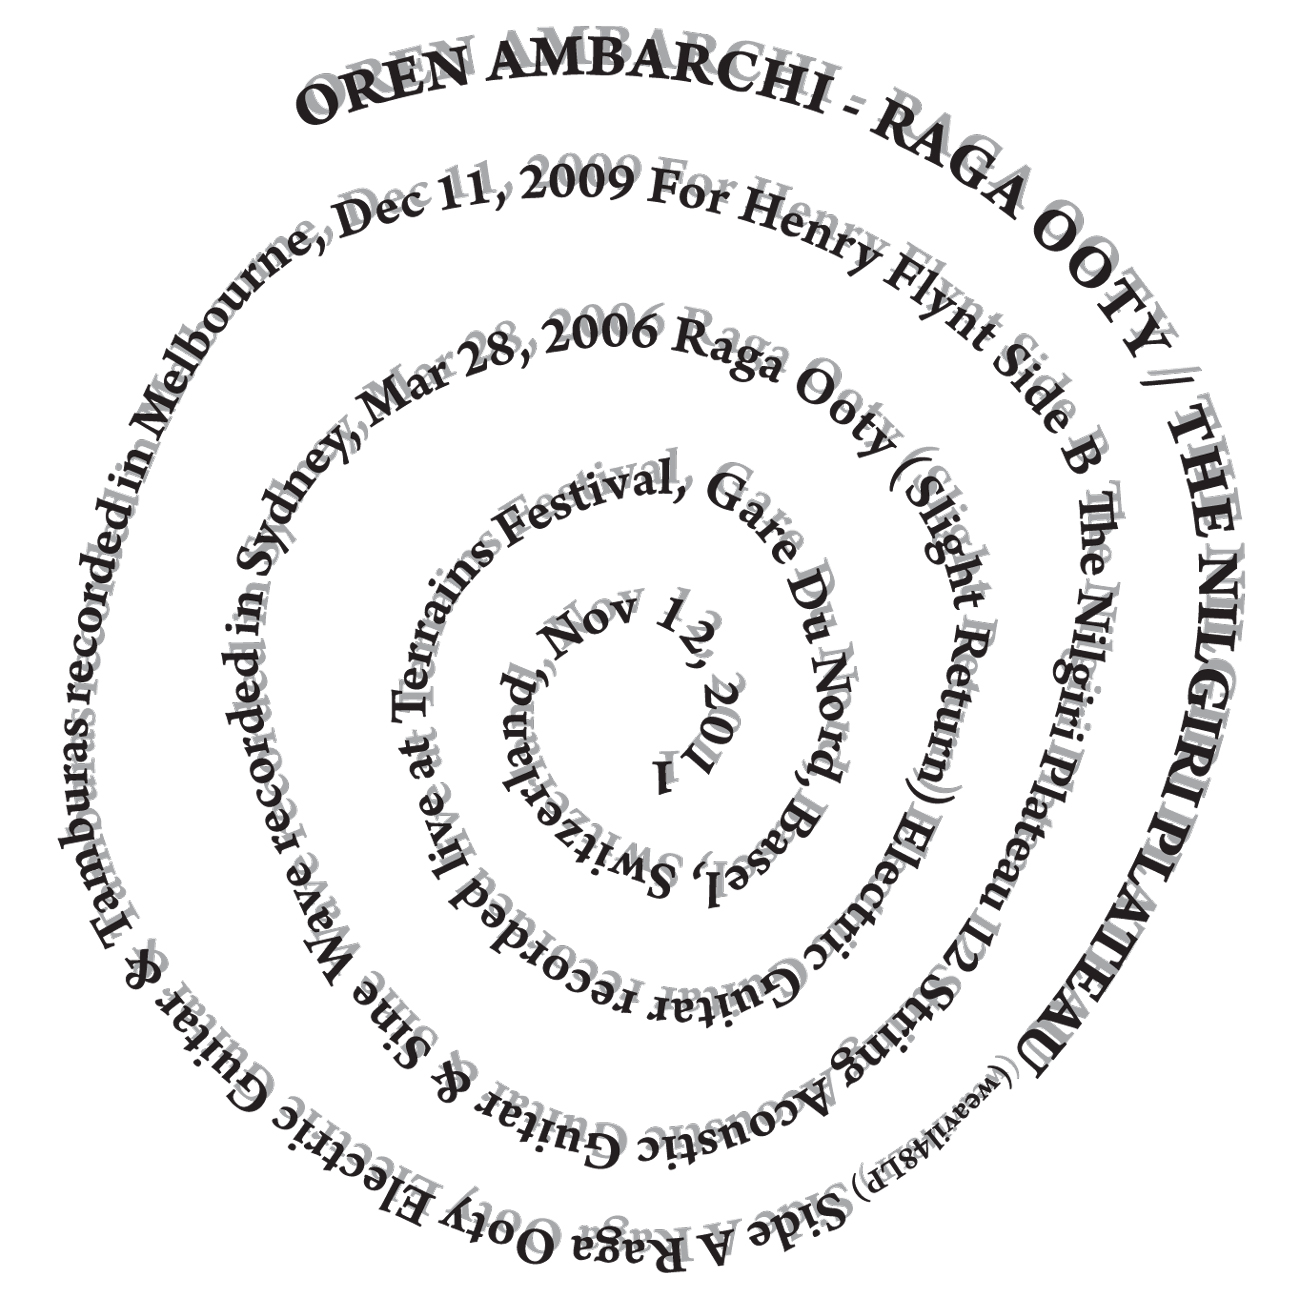 Oren ambarchi raga ooty nilgiri plateau bo'weavil recordings 2012 ½